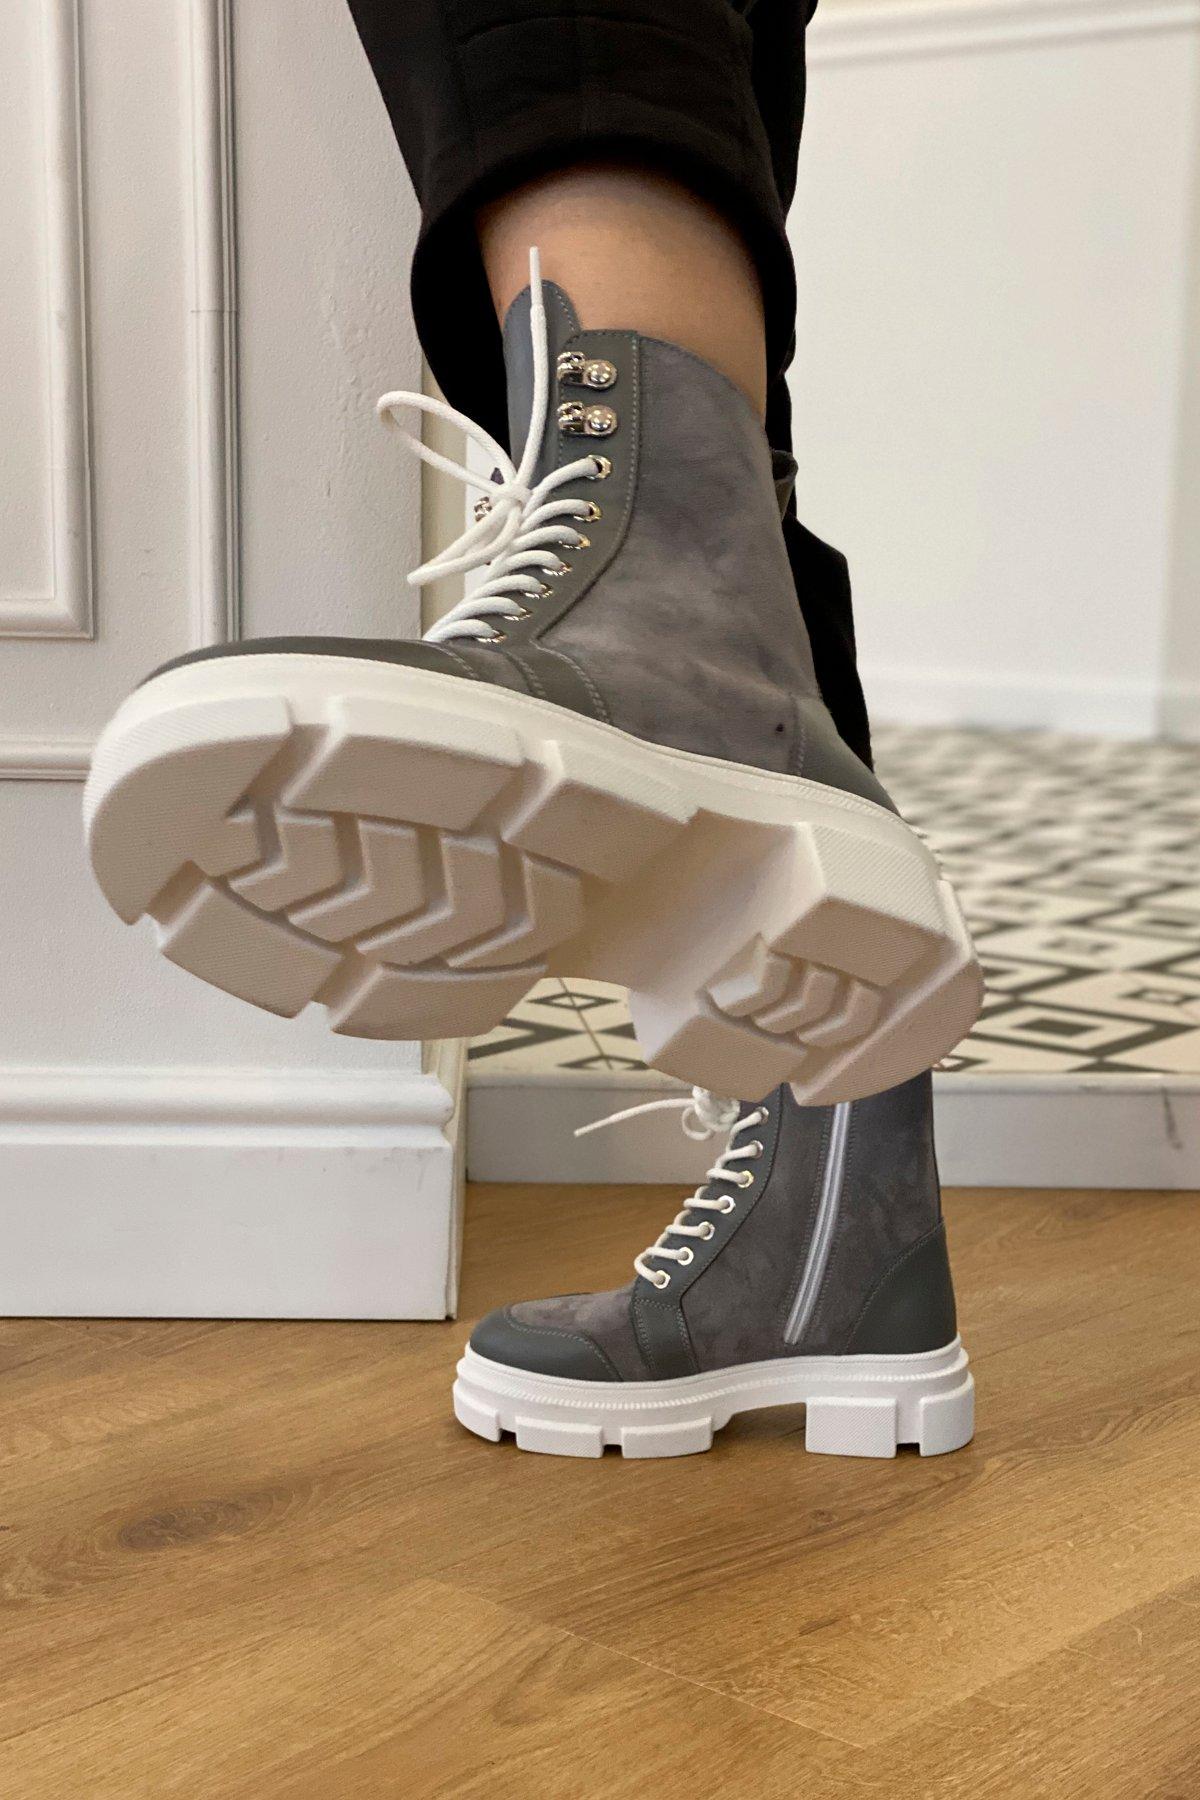 Ботинки зимние 260/14 (замш,вставки кожа,на шнурках) АРТ. 46440 Цвет: Серый - фото 2, интернет магазин tm-modus.ru